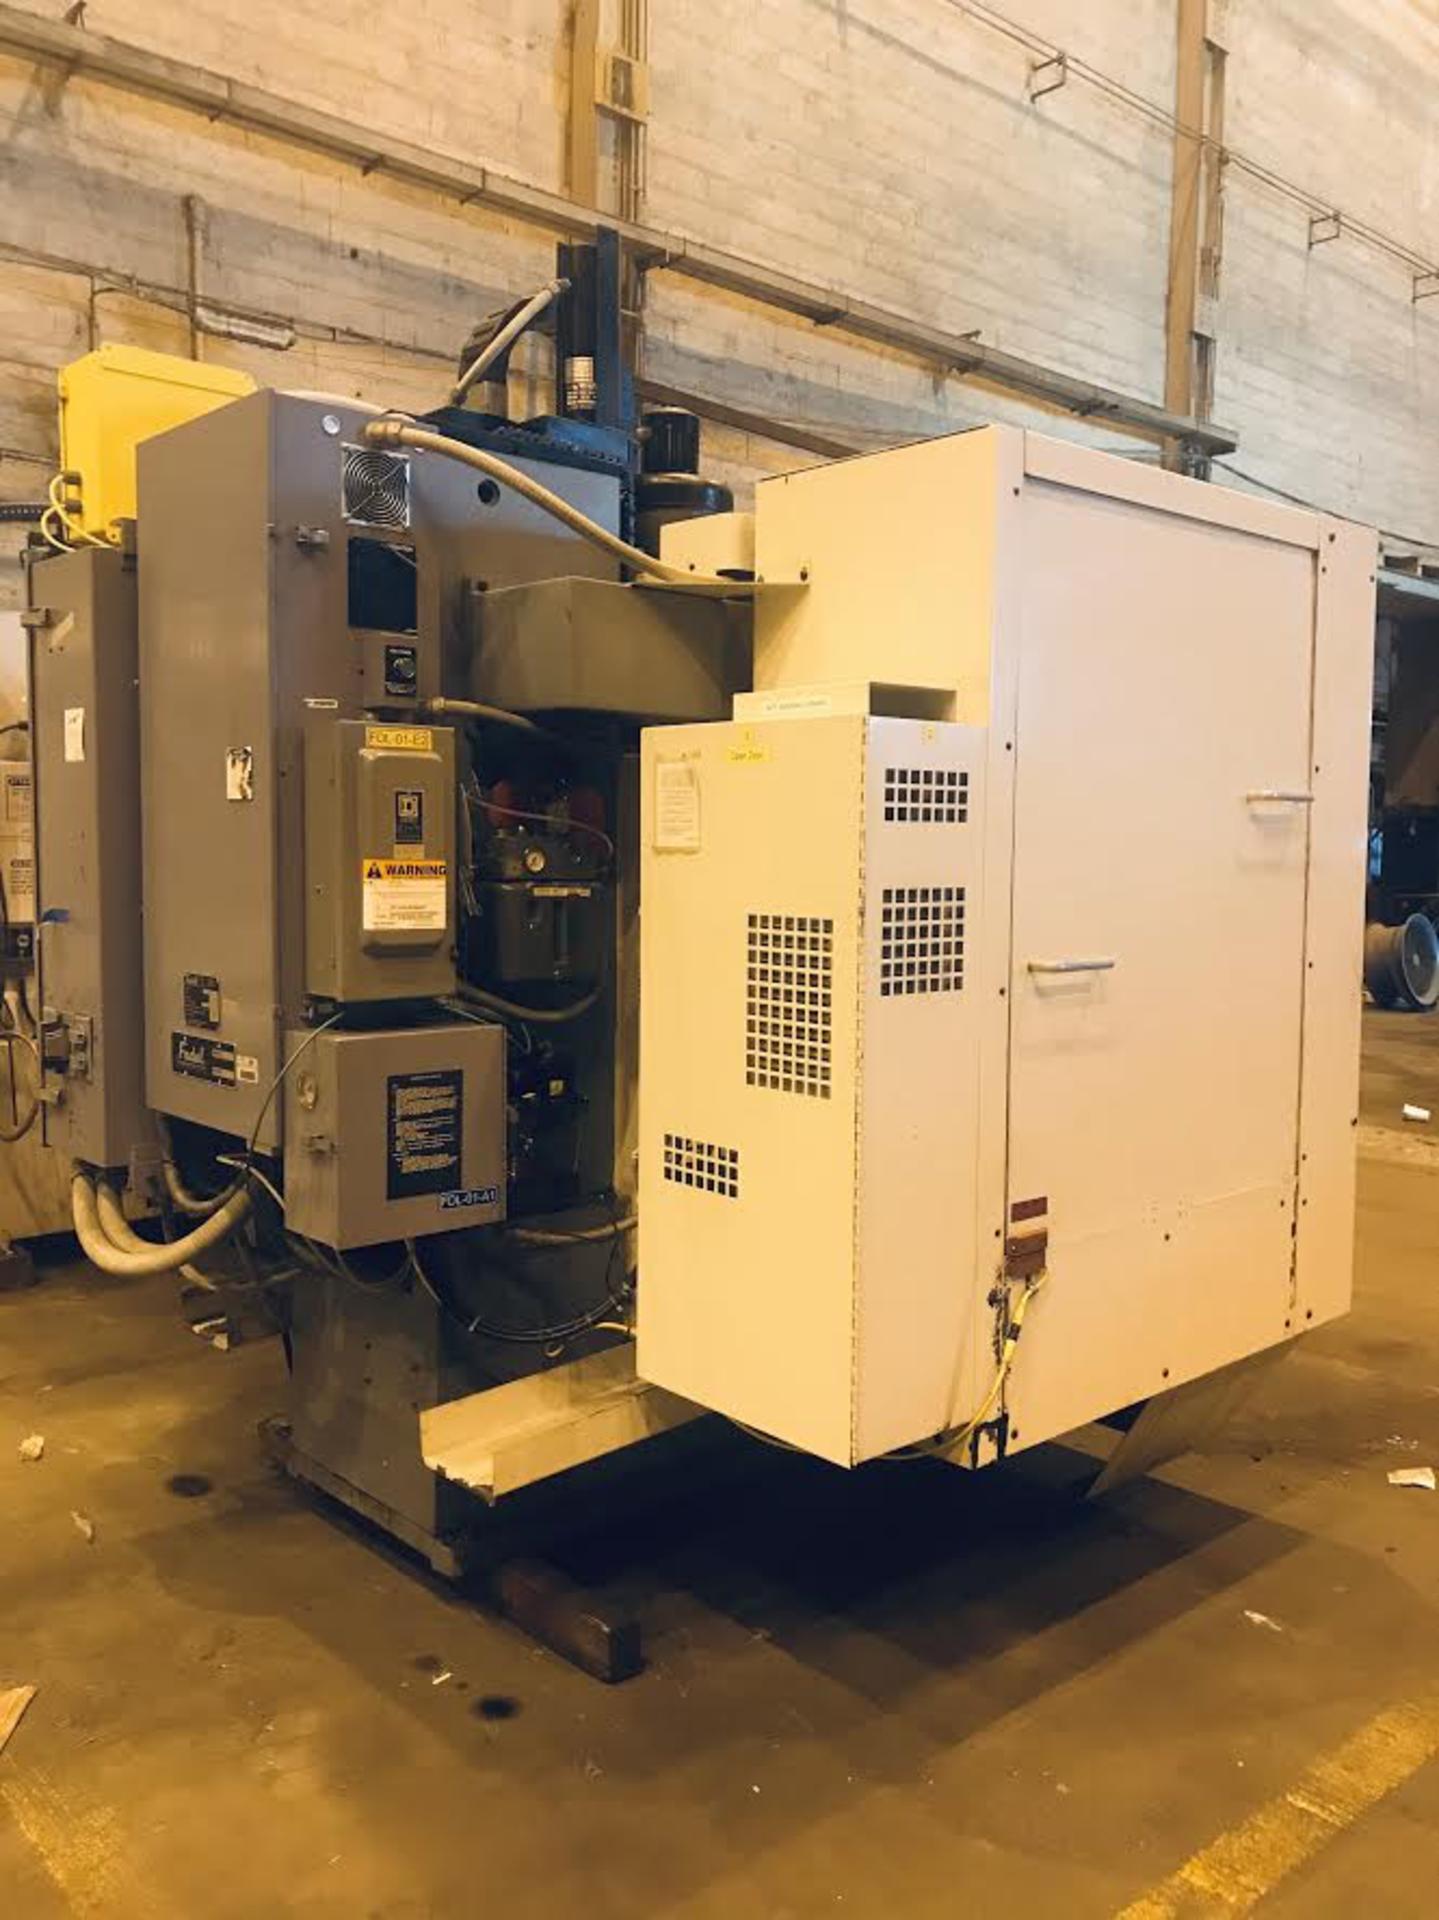 Lot 21 - Fadal 904-L VMC 40 CNC Vertical Milling Machine